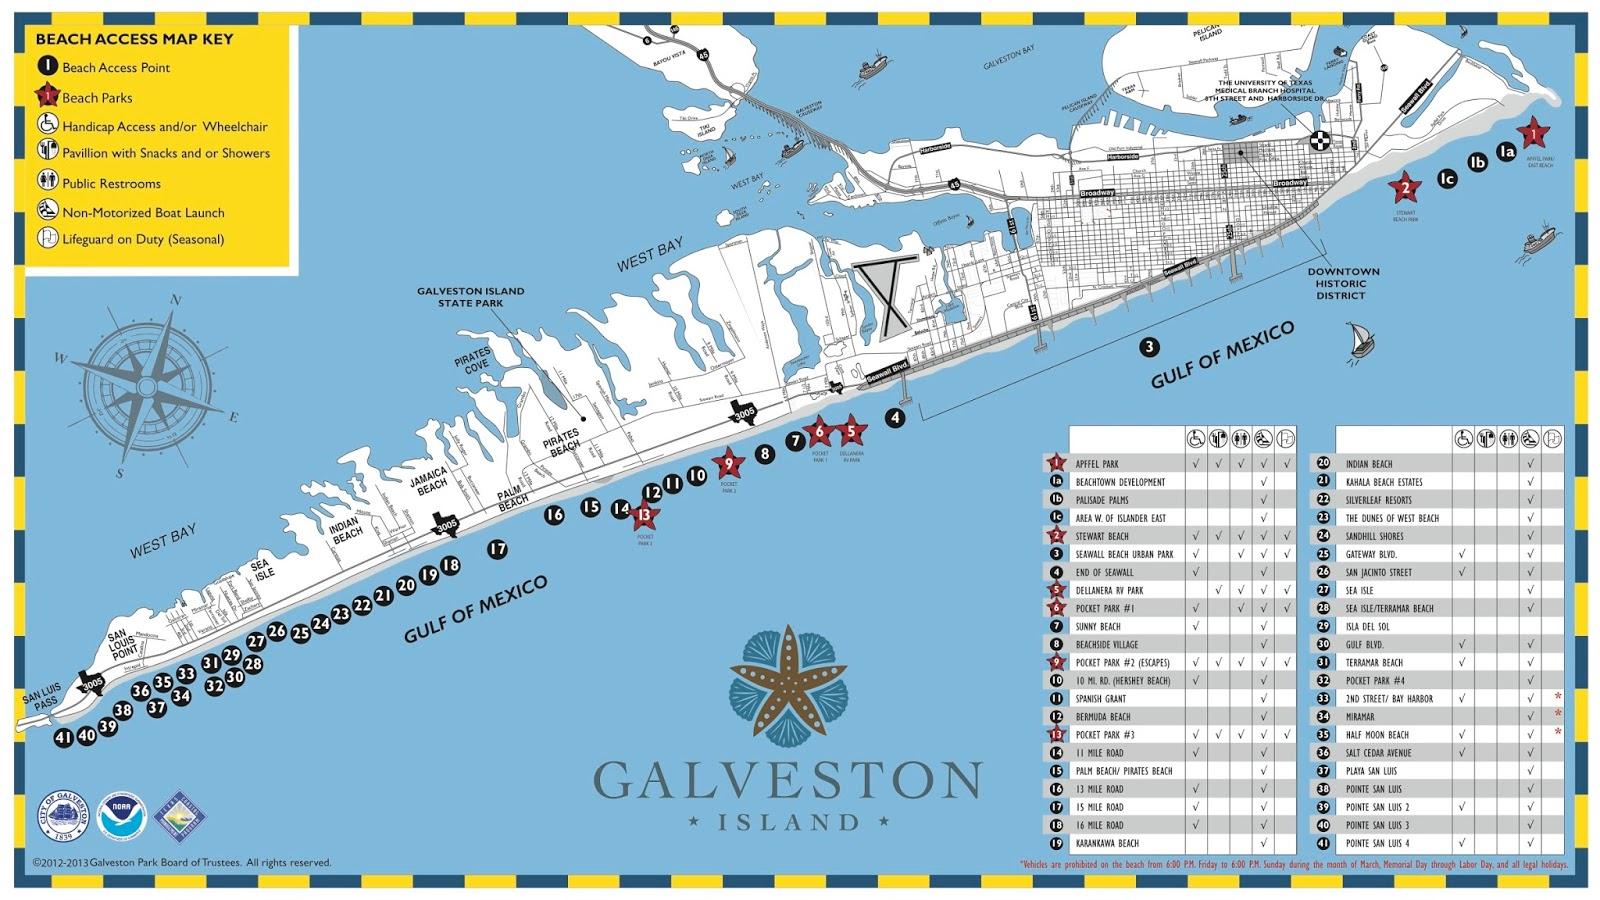 Galveston Island Kids Galveston Islands Free Beaches